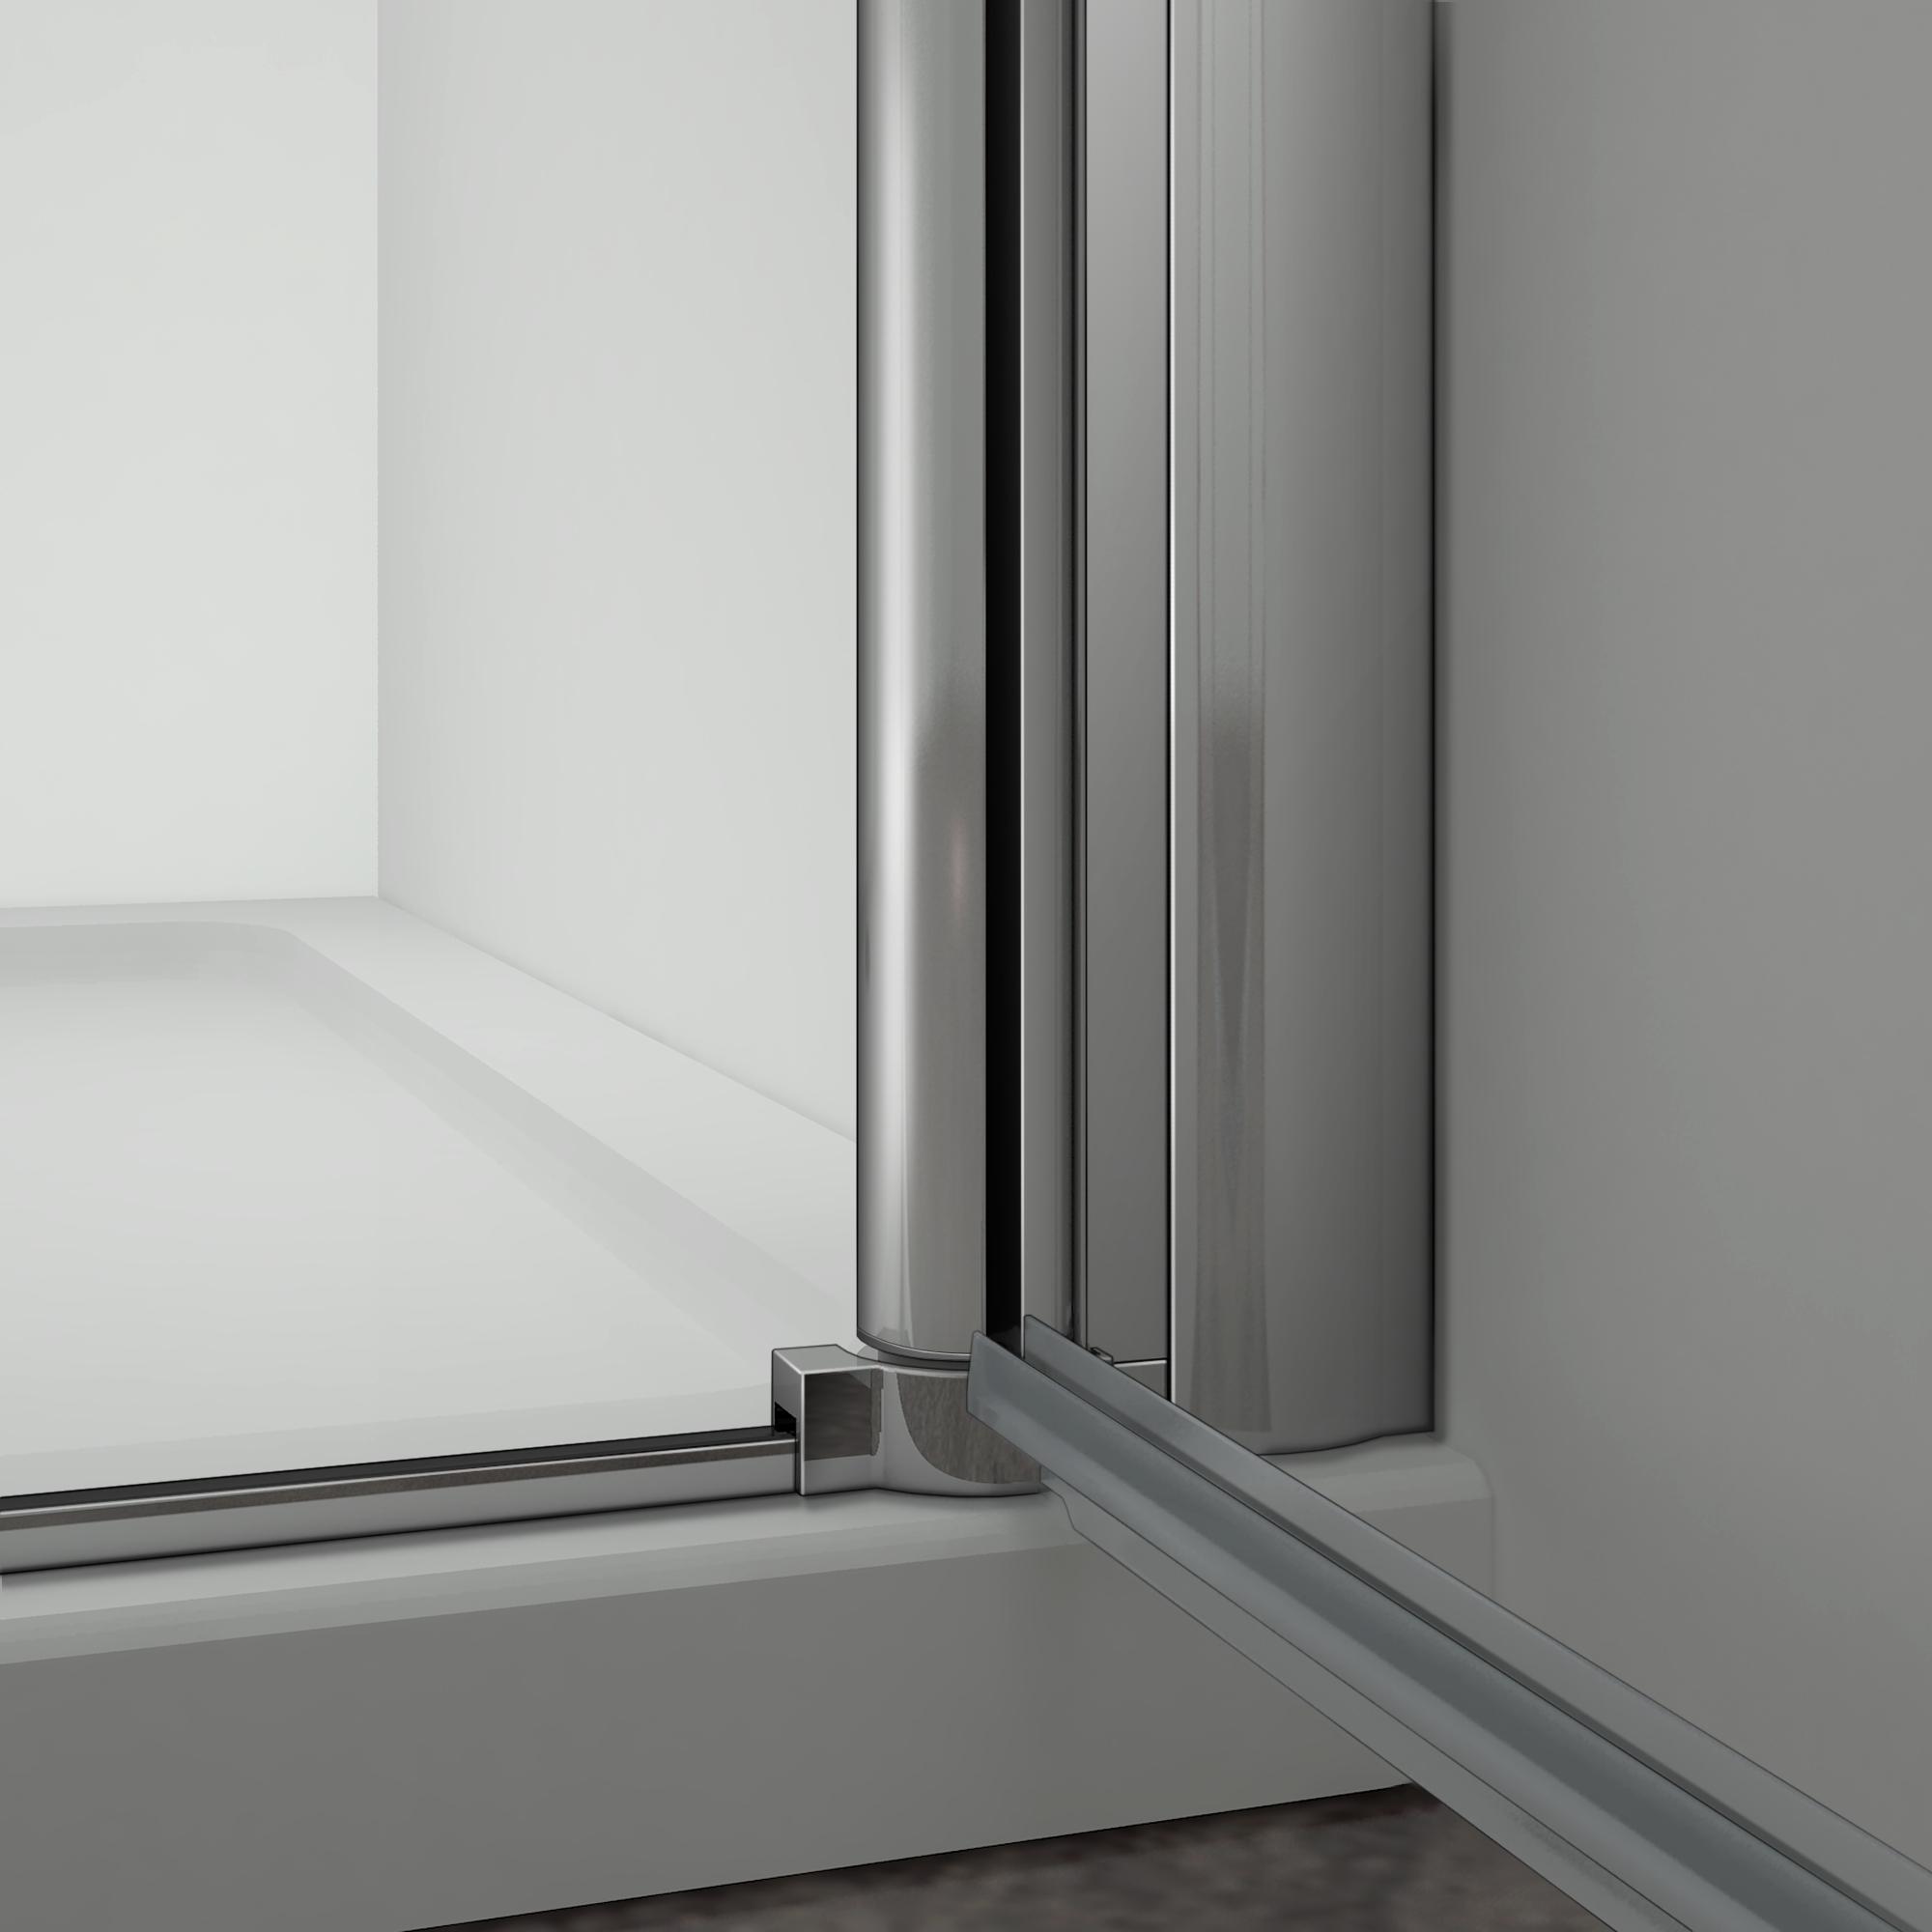 90x80x185cm porte pivotante porte de douche paroi de - Fixation porte de douche ...